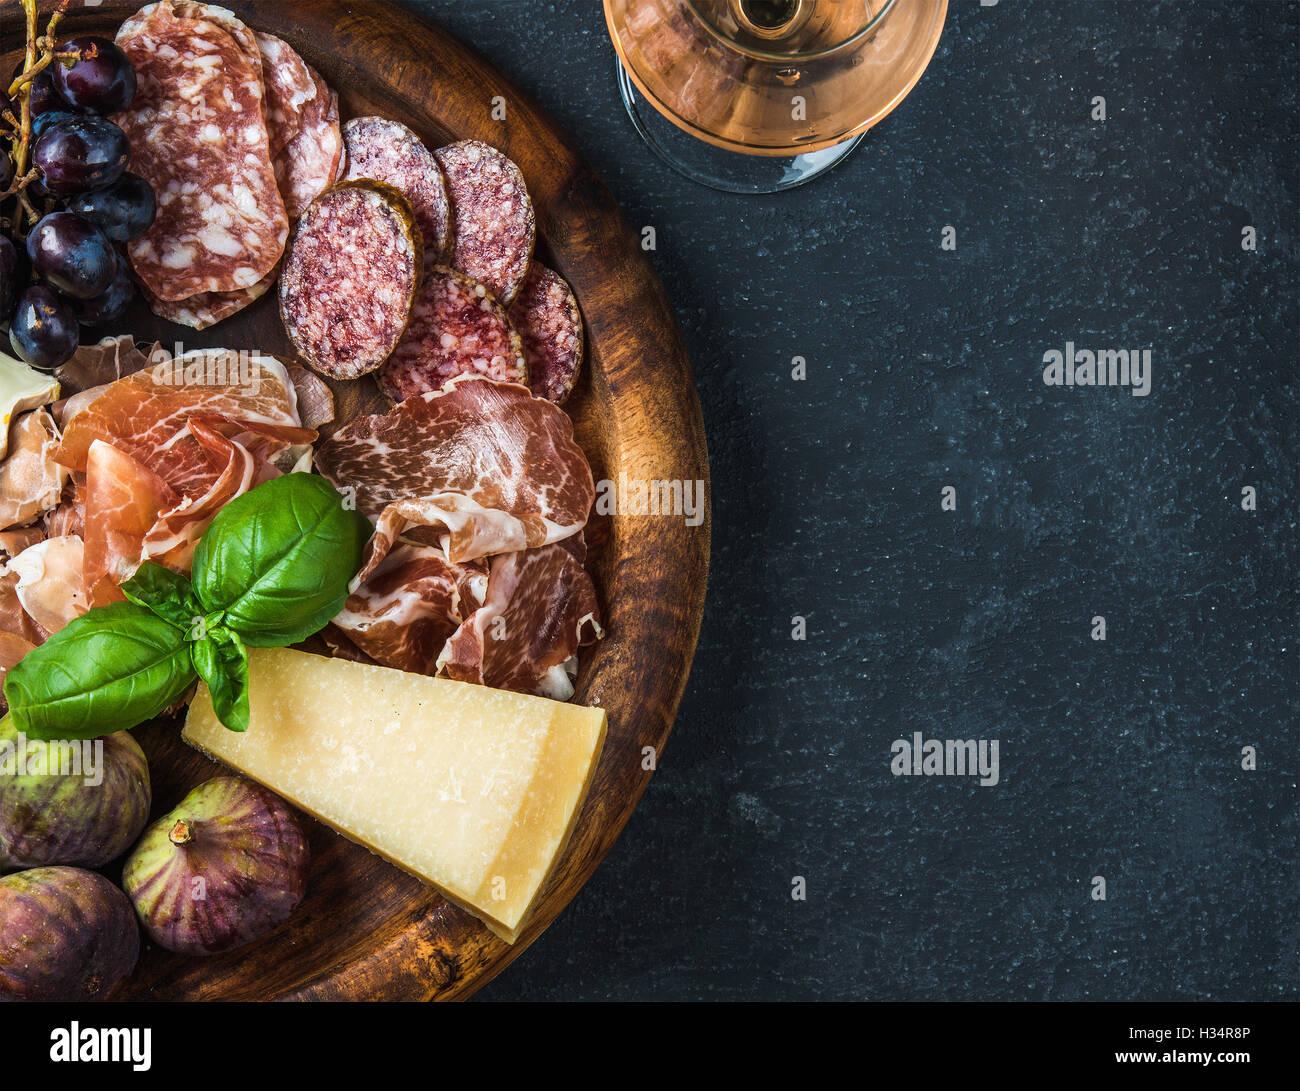 Italian antipasti snack for wine on wooden tray, dark background - Stock Image